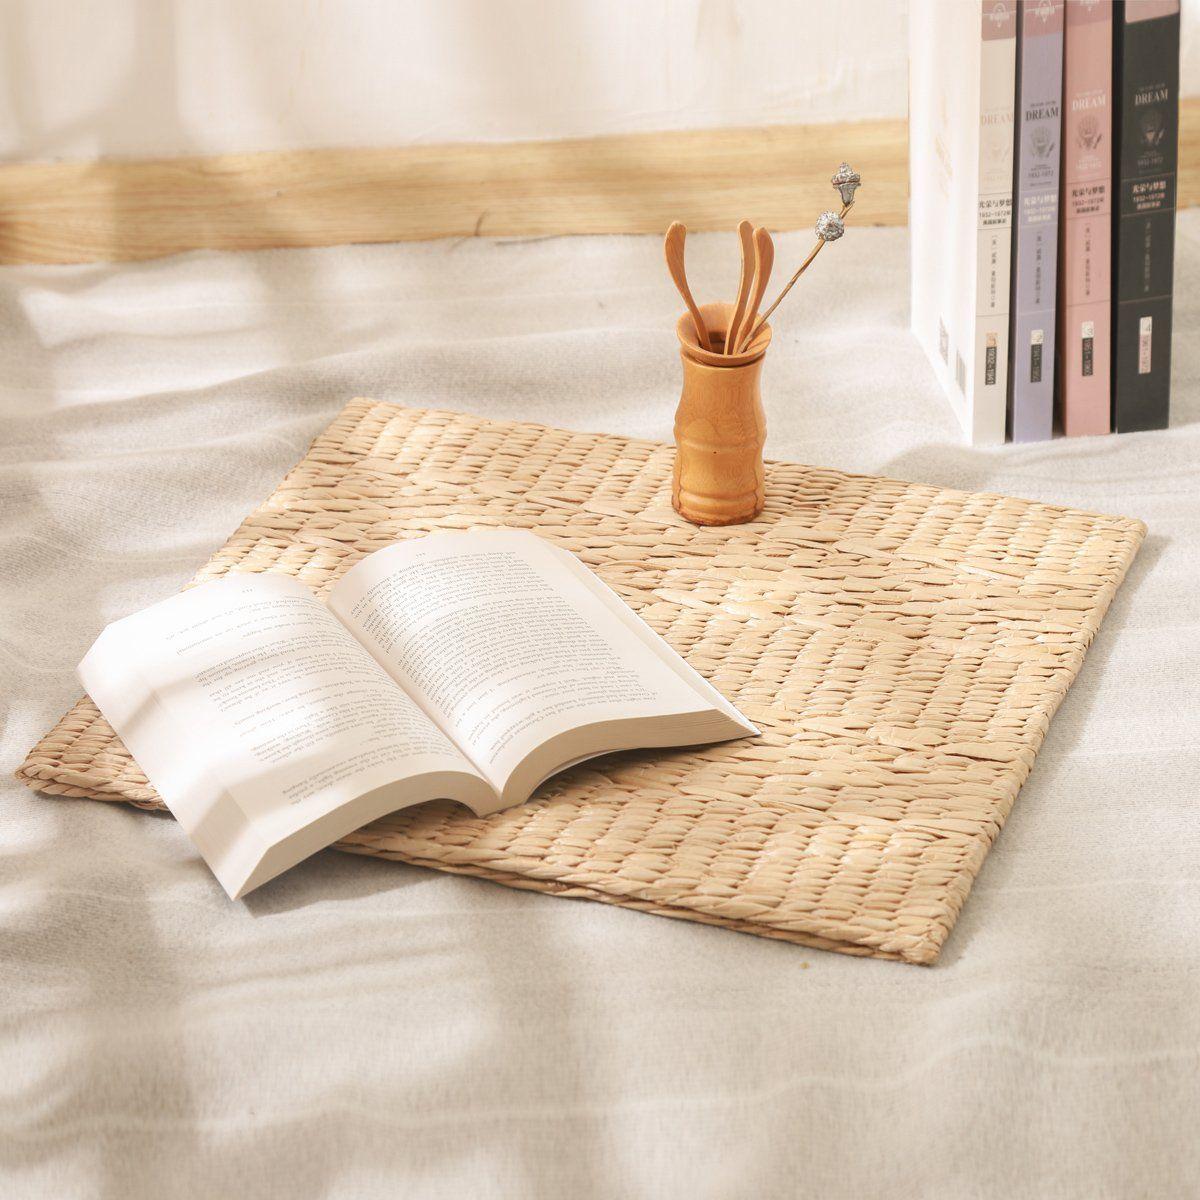 Eshow Handmade Woven Natural Seat Furniture Floor Pillow